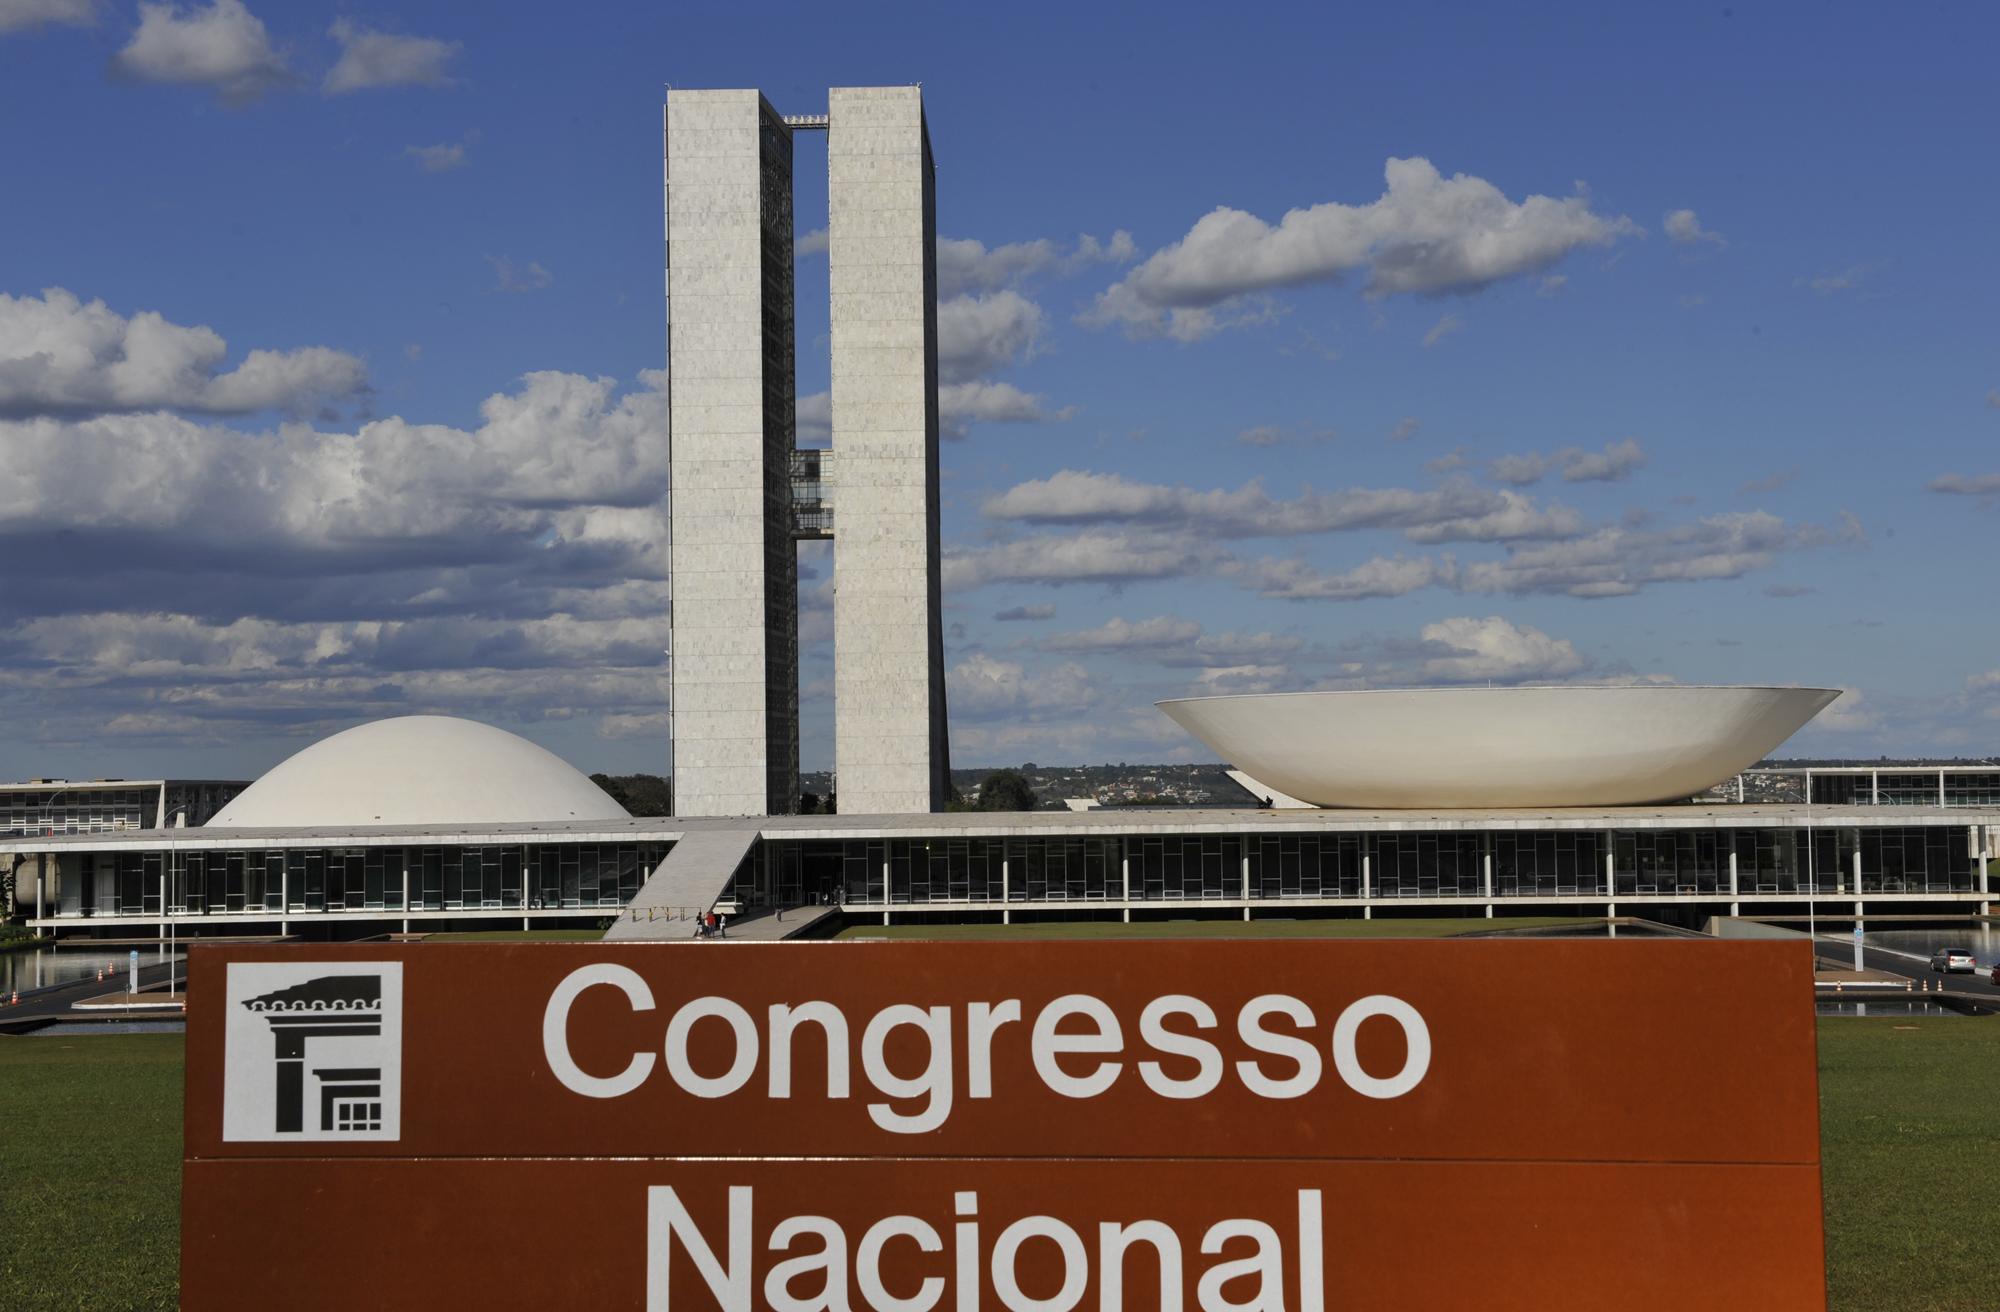 Palácio do Congresso Nacional foto Rodolfo Stuckert 08.06.09